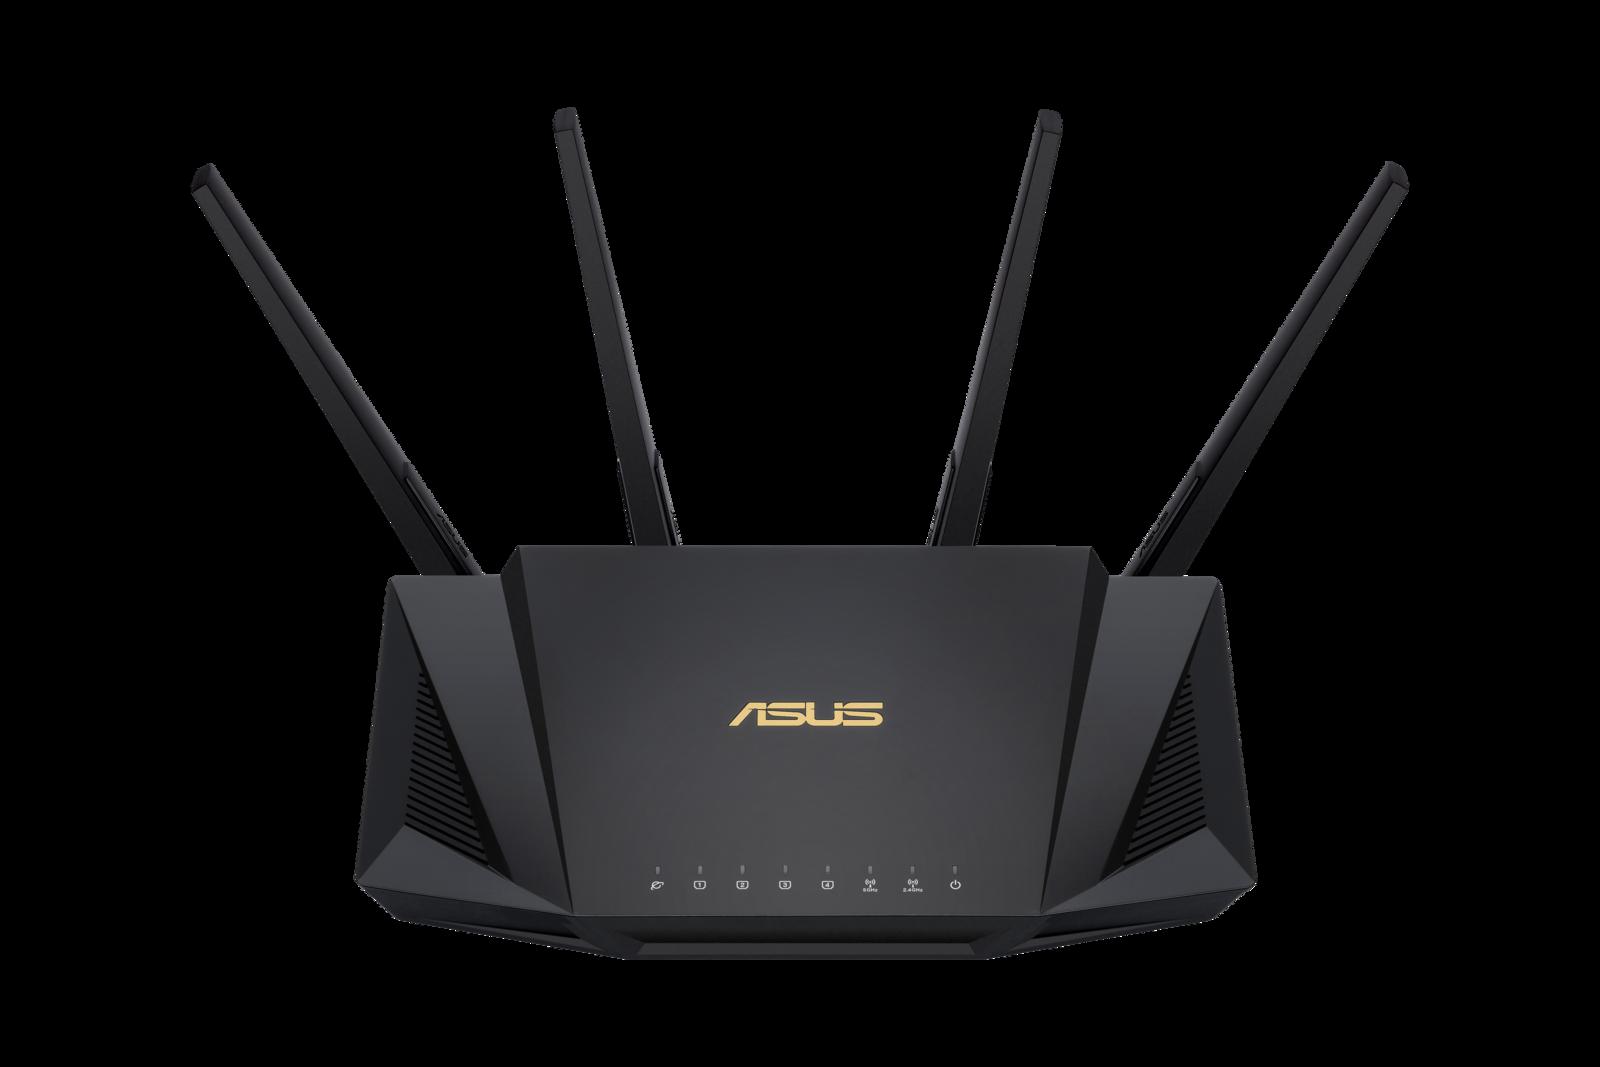 ASUS RT-AX3000 Gigabit Dual Band Wi-Fi6 Router image